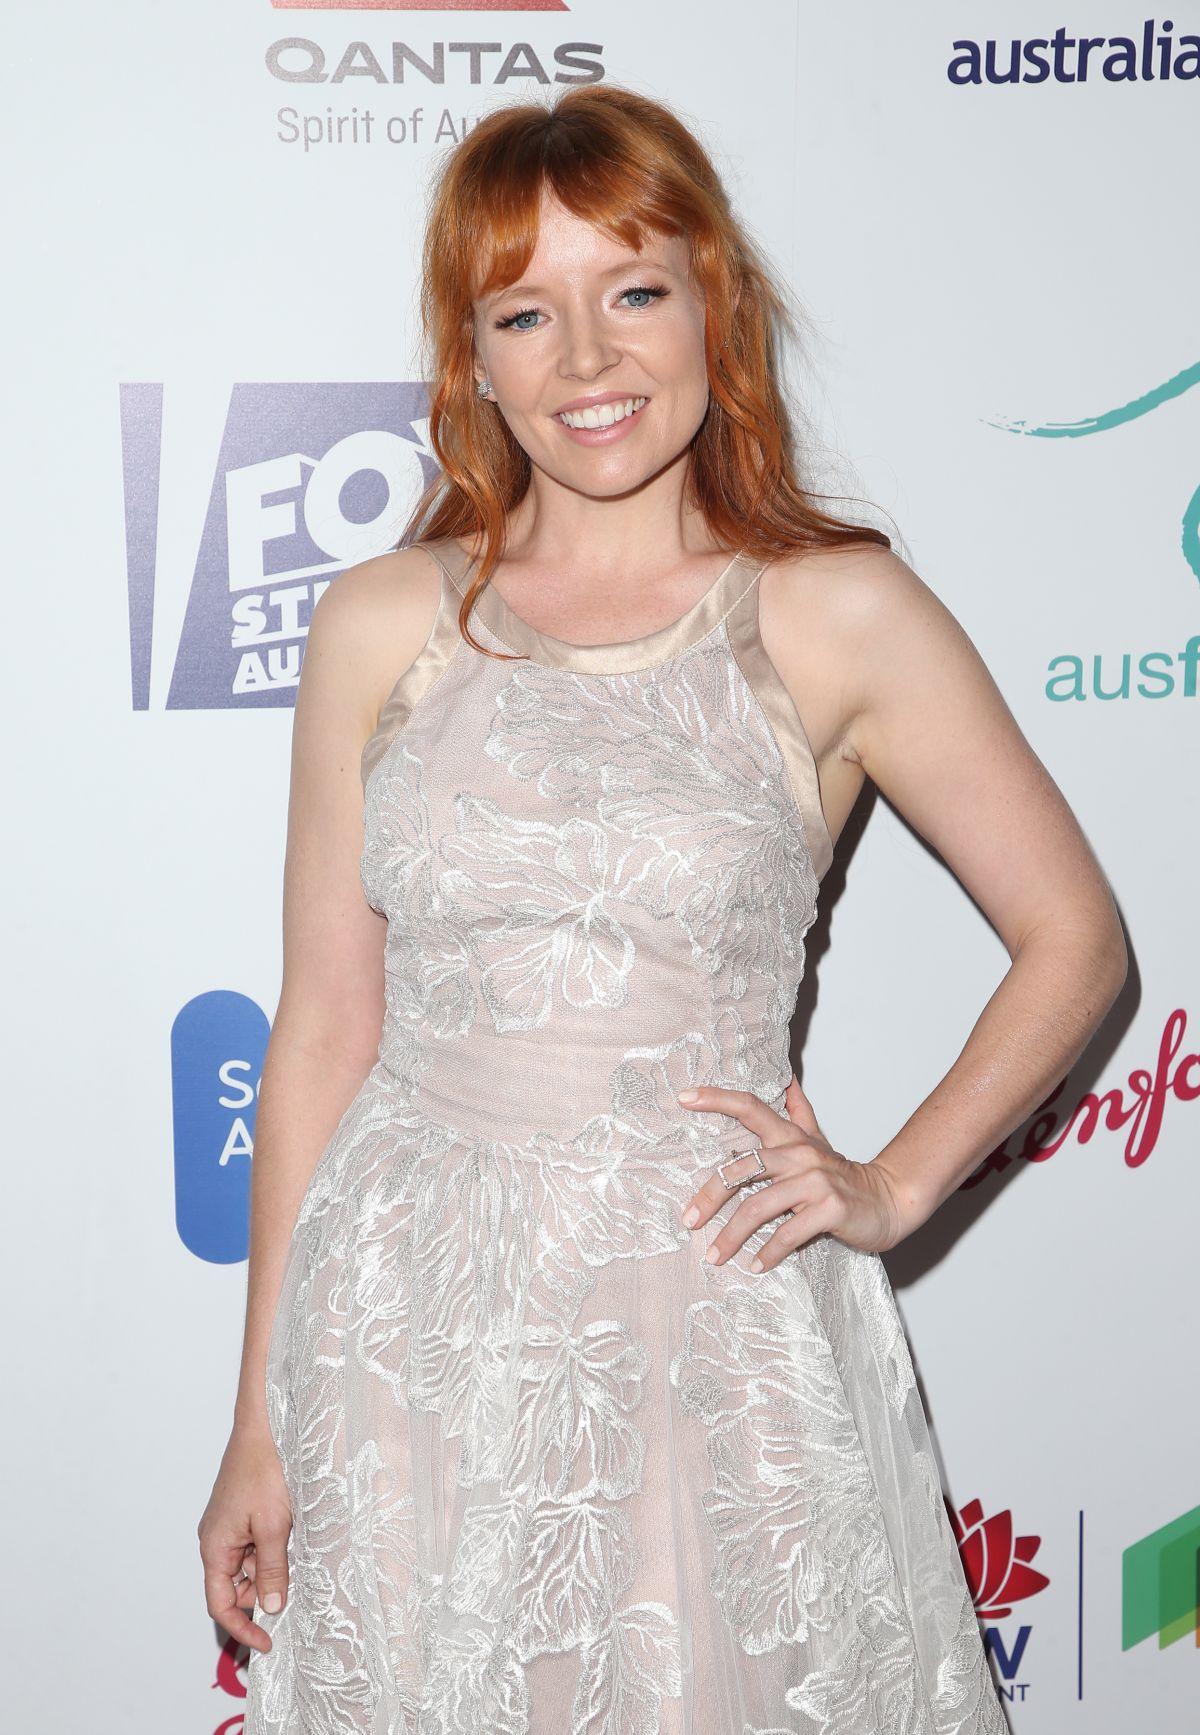 Lexi Ainsworth born October 28, 1992 (age 26)